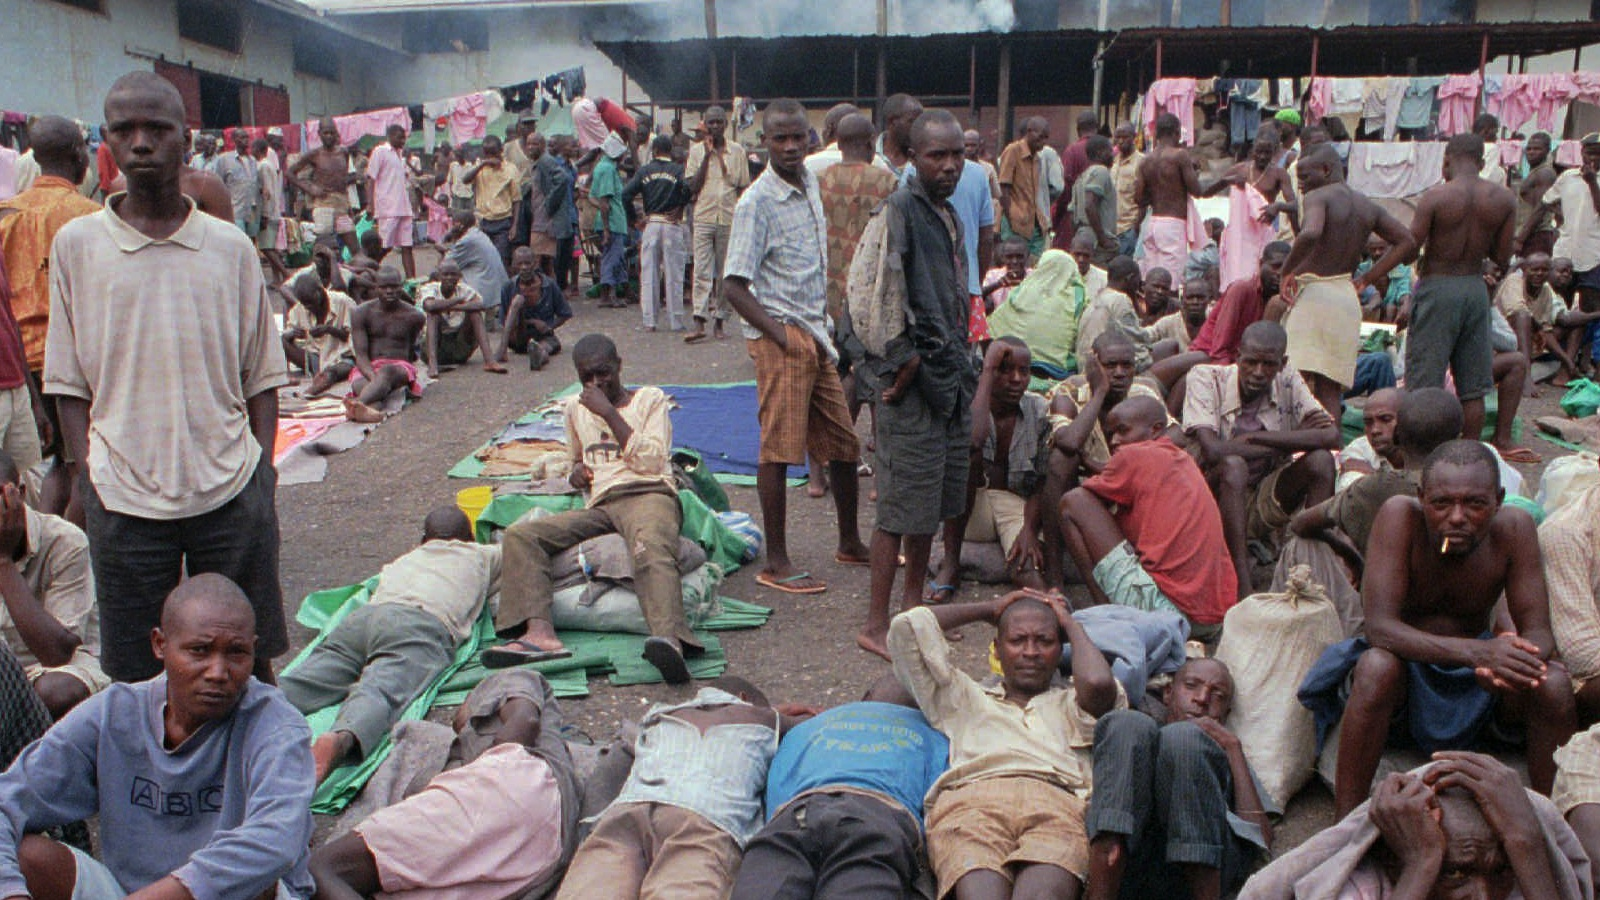 Detainees at Kigali's Gikondo Detention Center